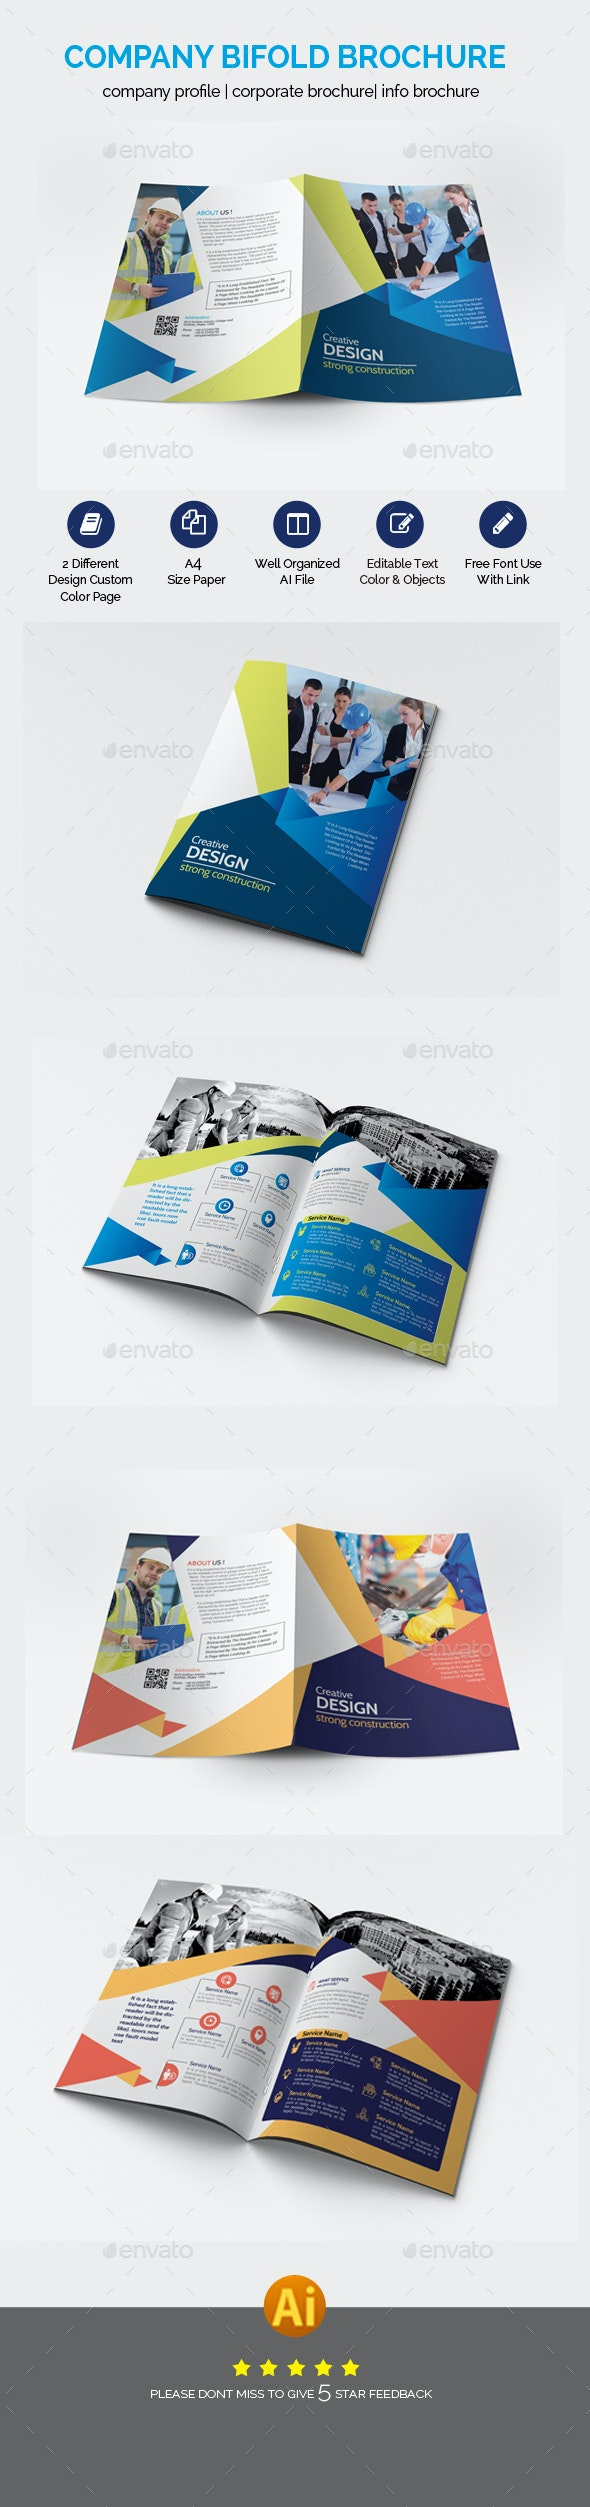 Business Bifold Brochure Template - Brochures Print Templates